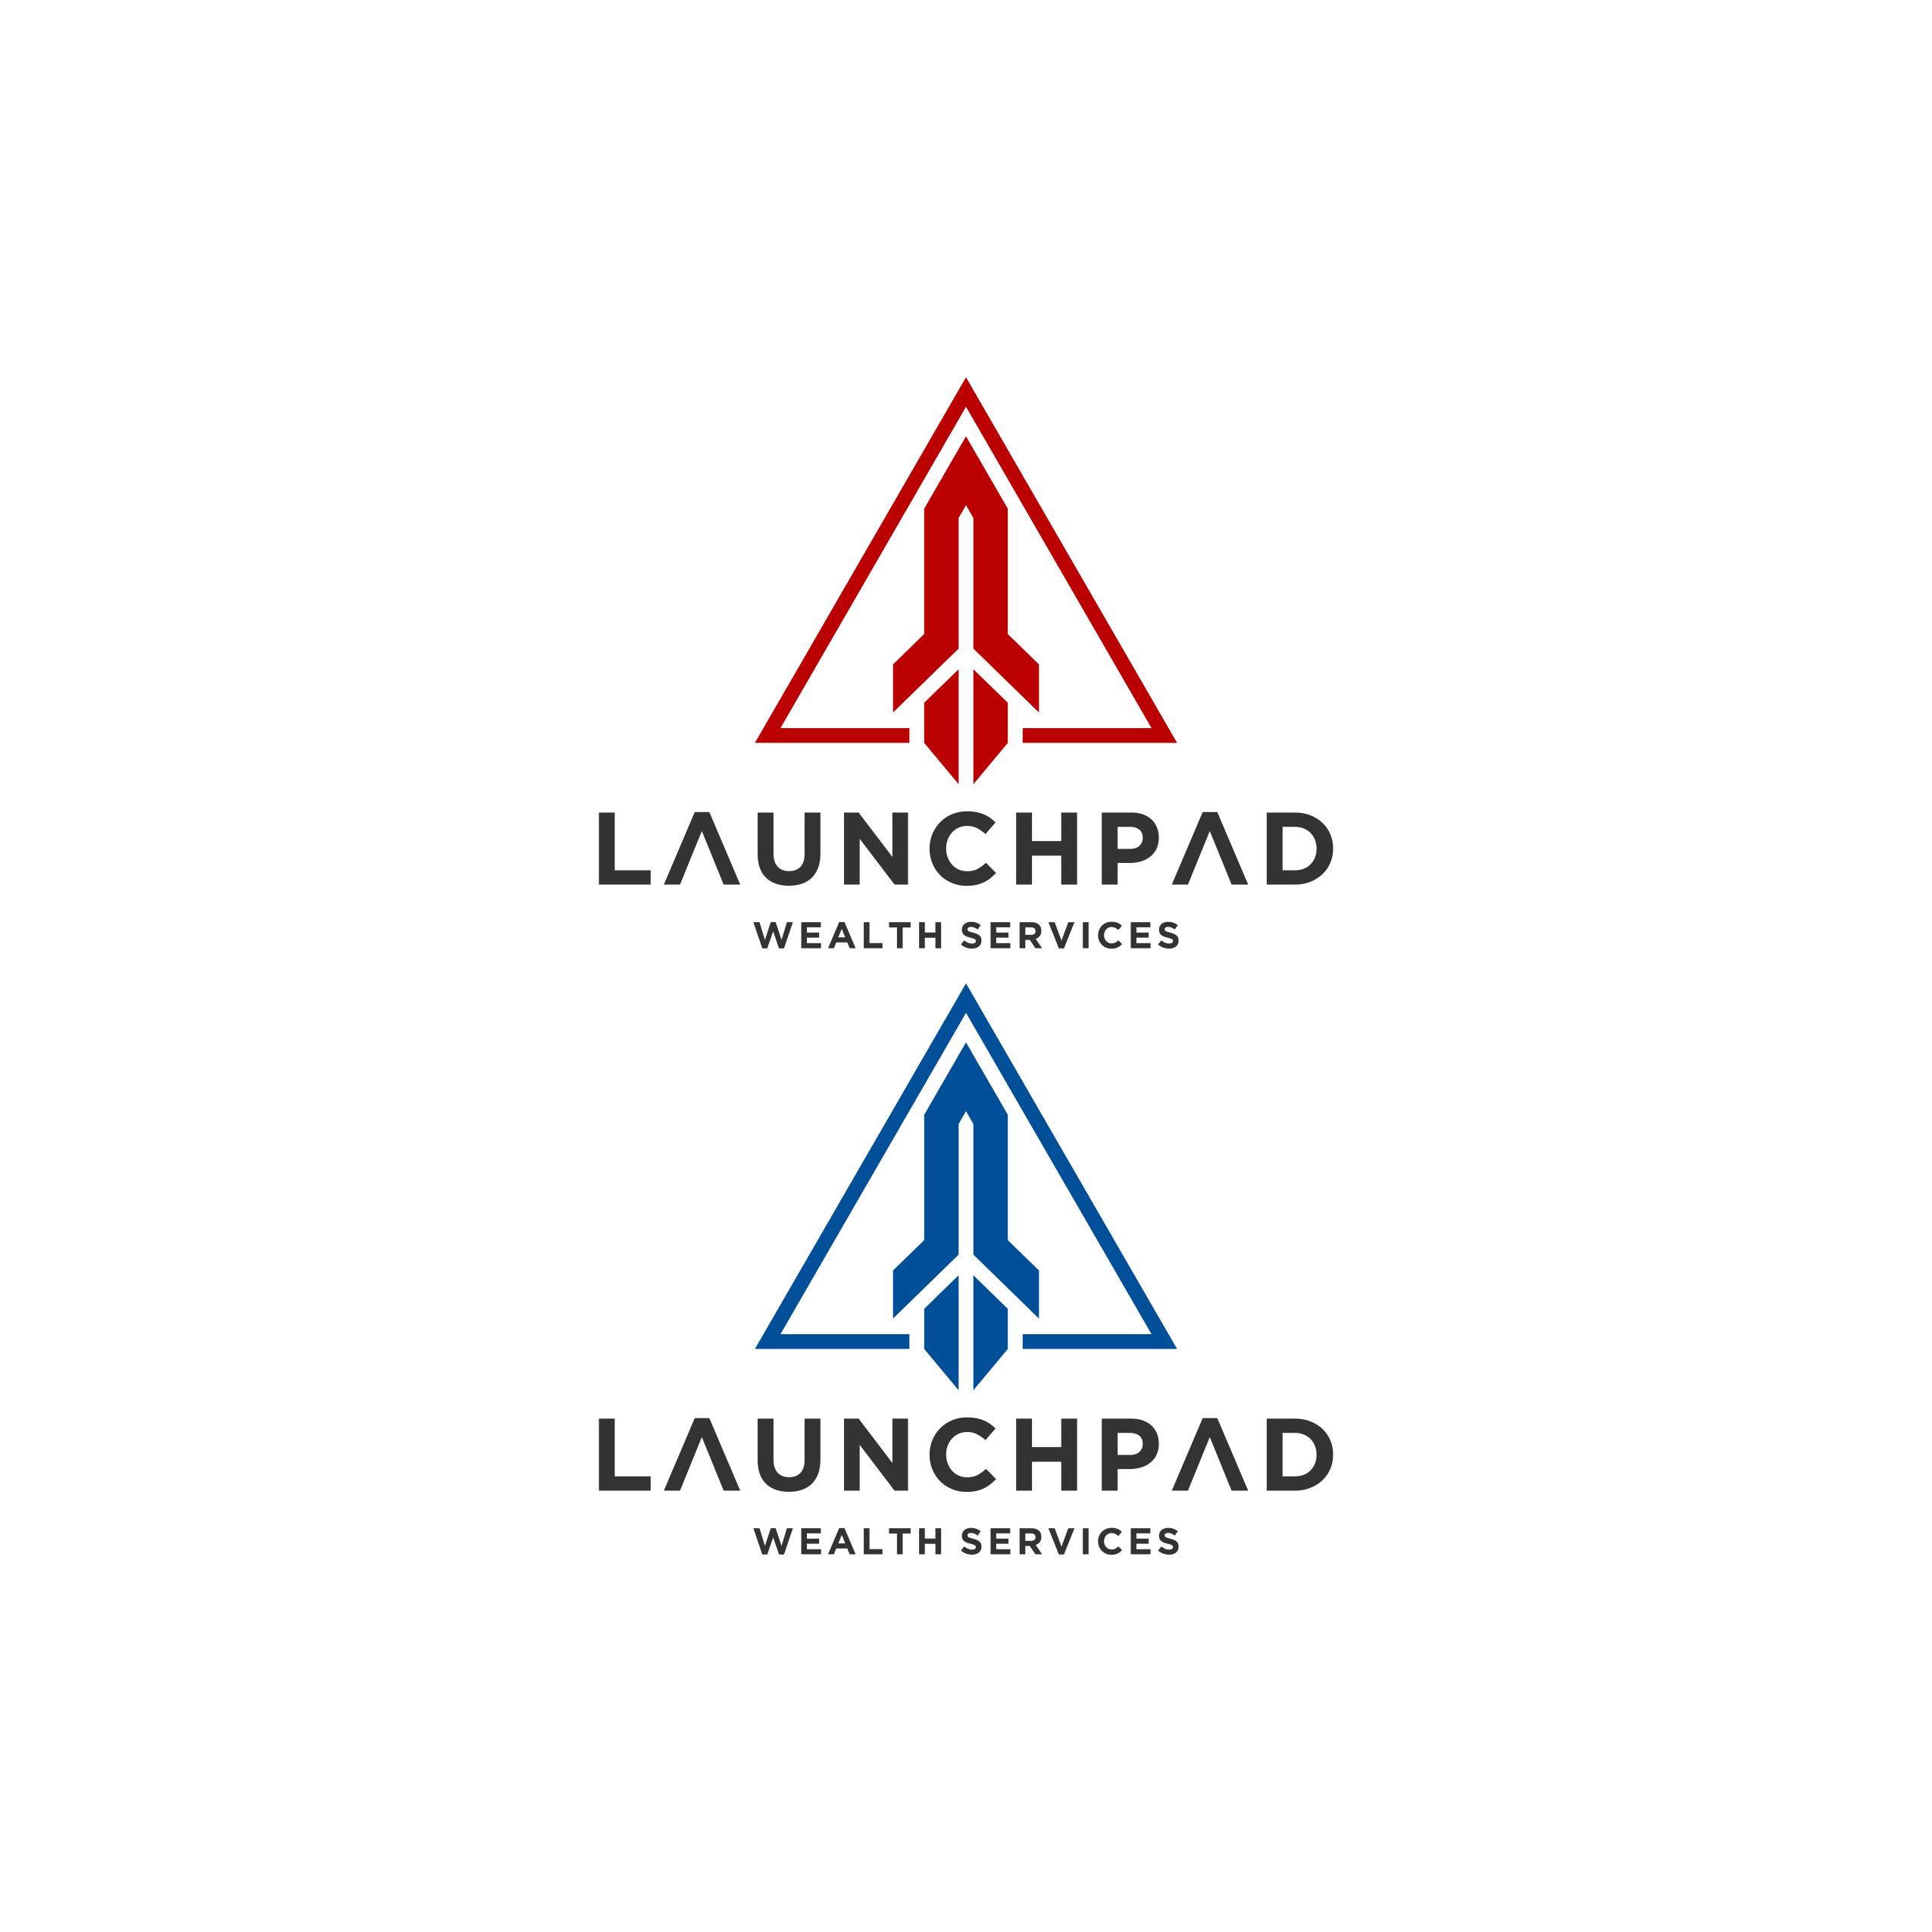 Launchpad Wealth